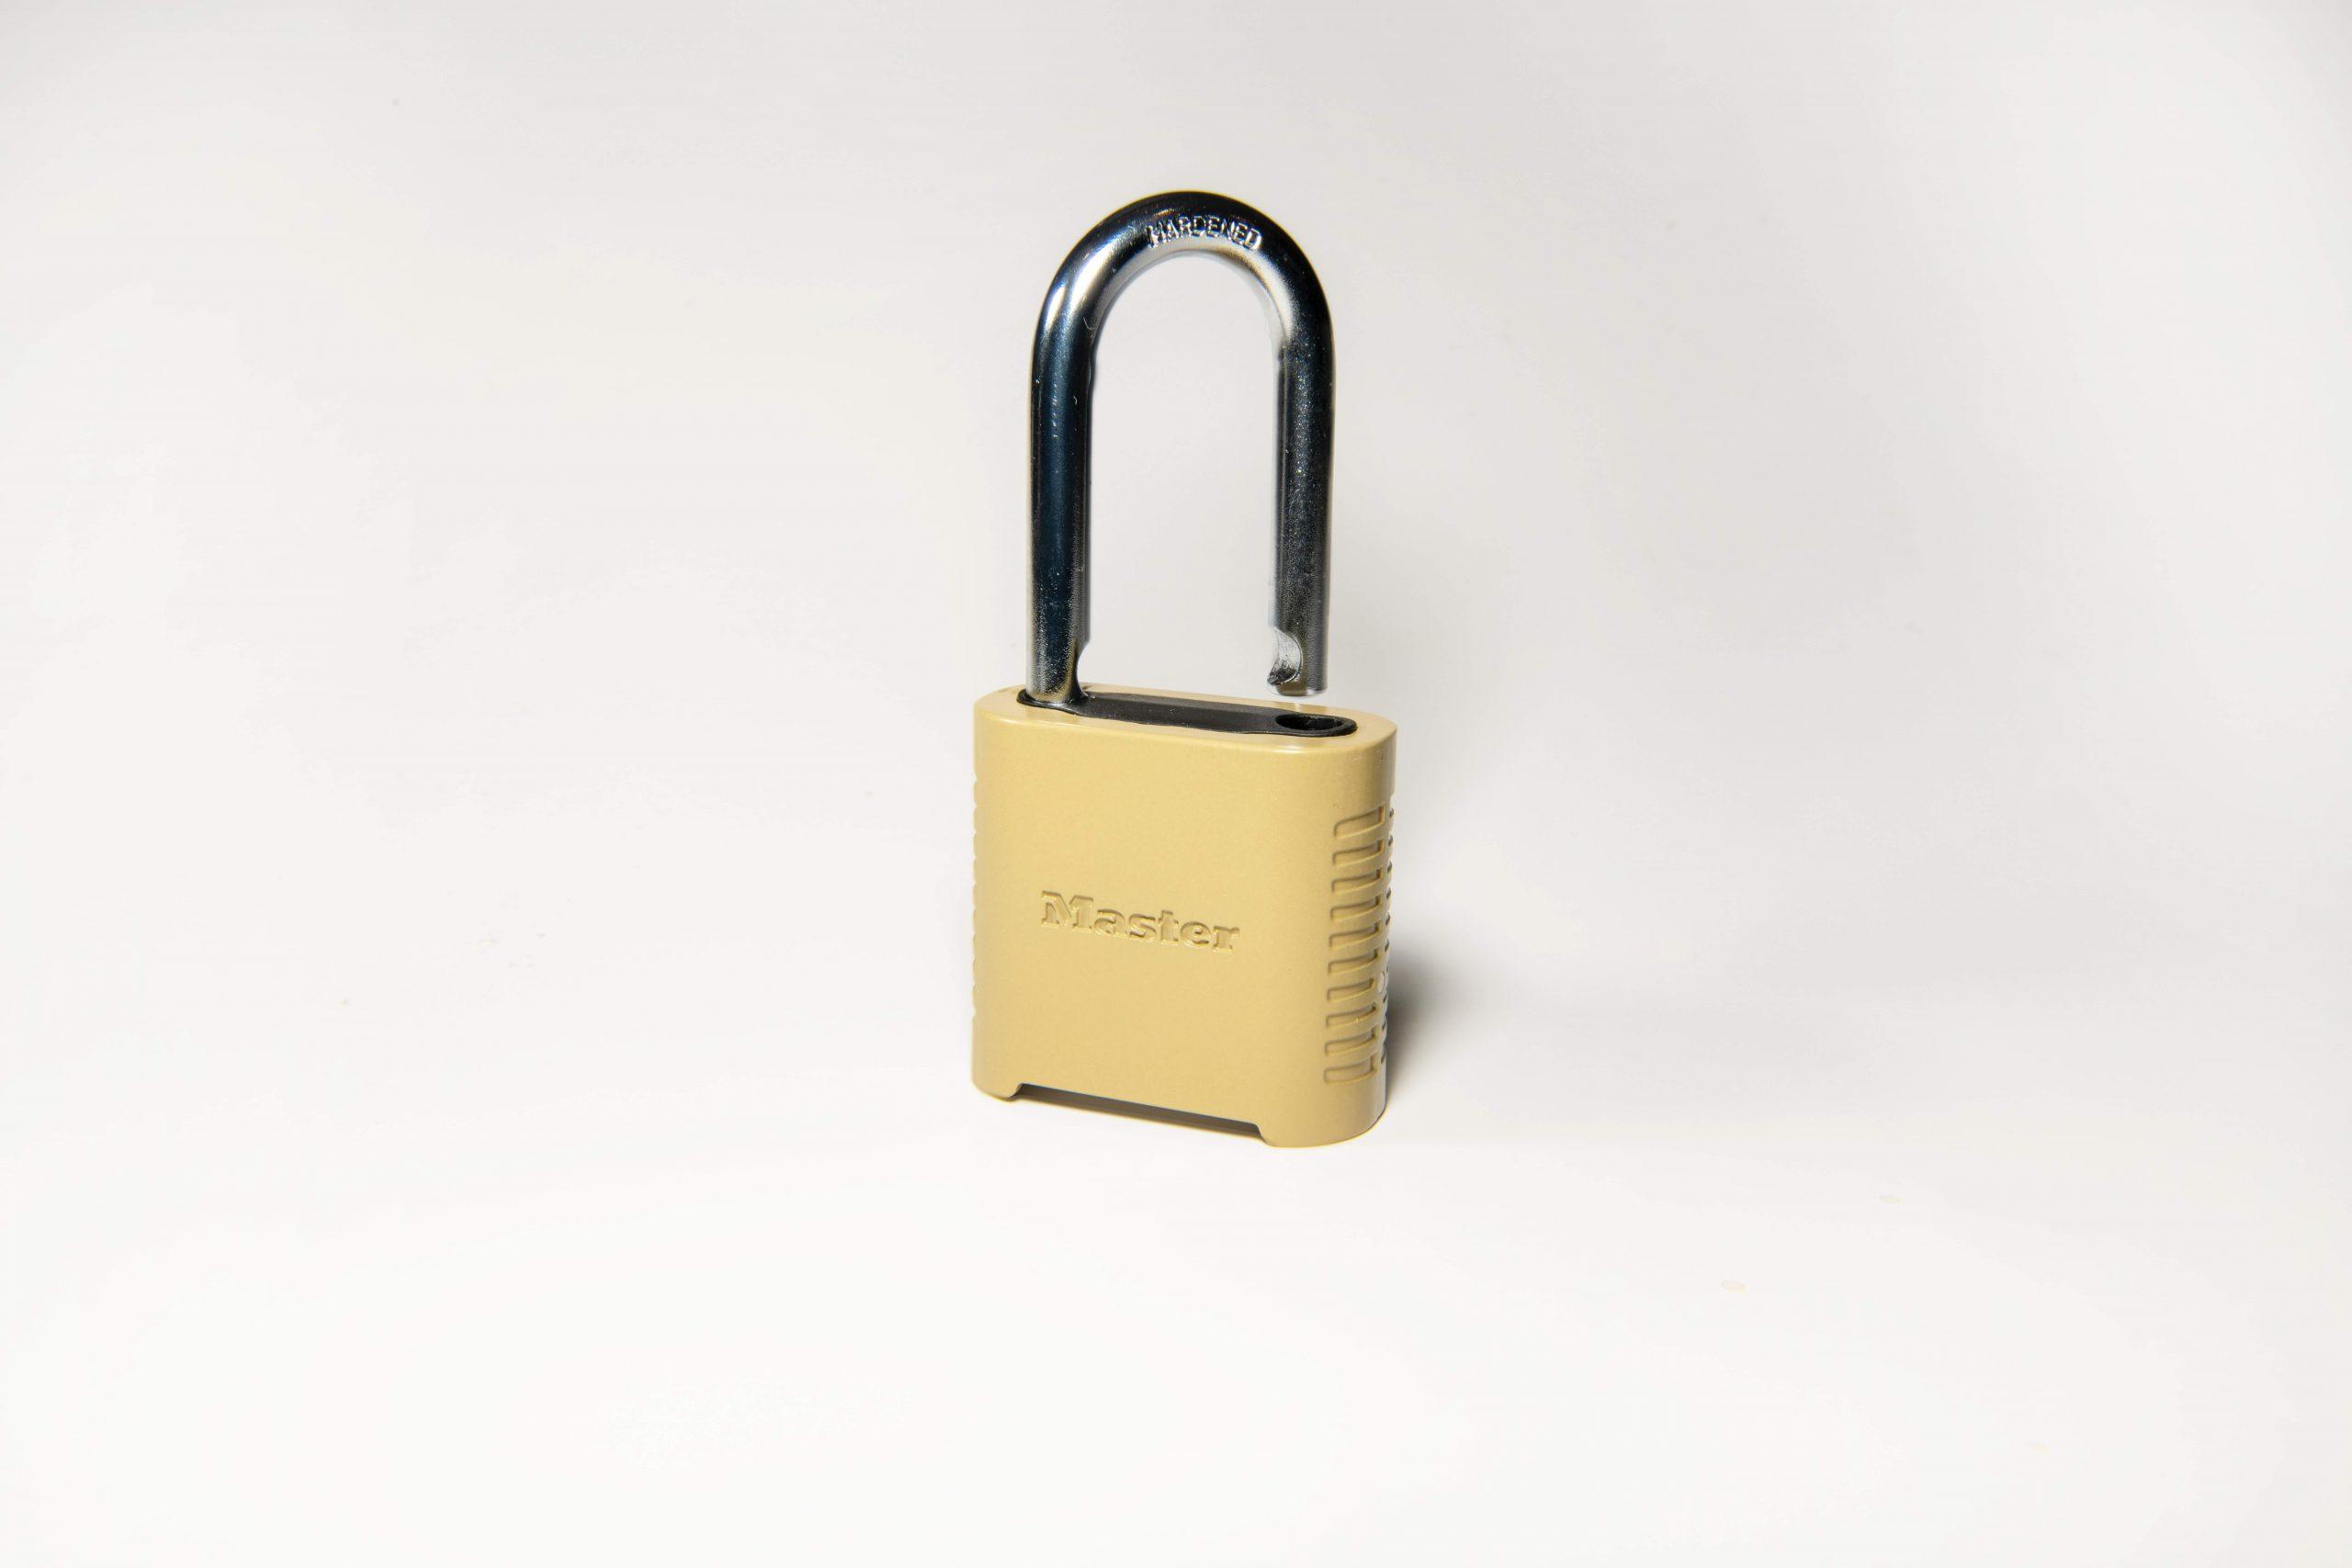 Open Padlock - Web Security